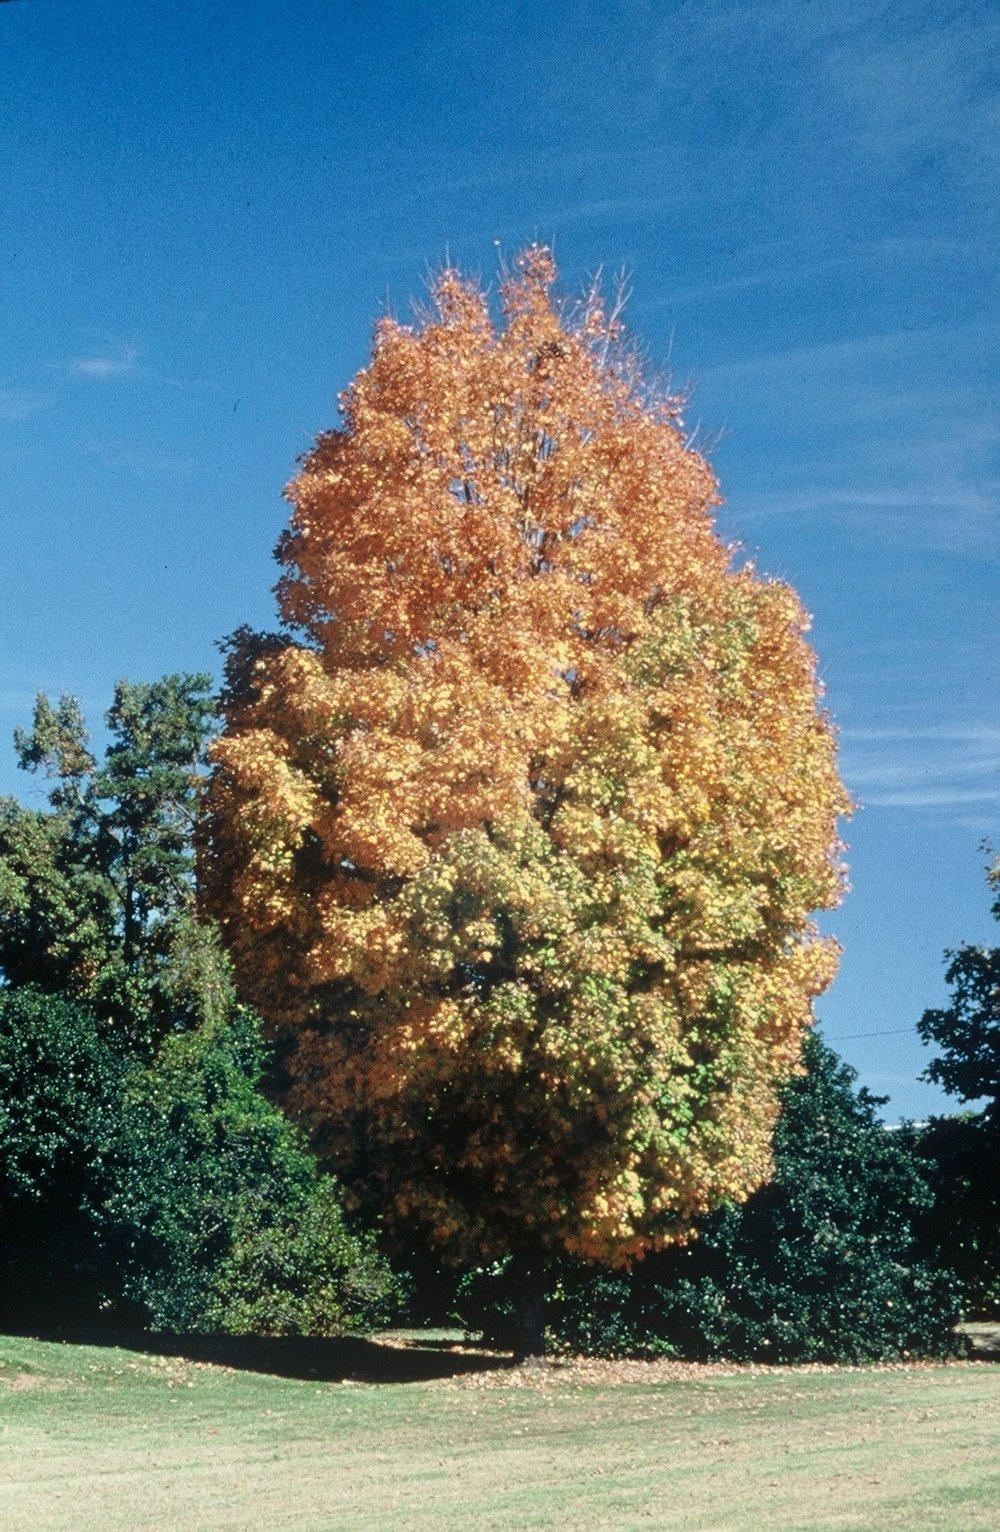 Steeple-Sugar-Maple-Acer-saccharum-fall-color-habit.jpg